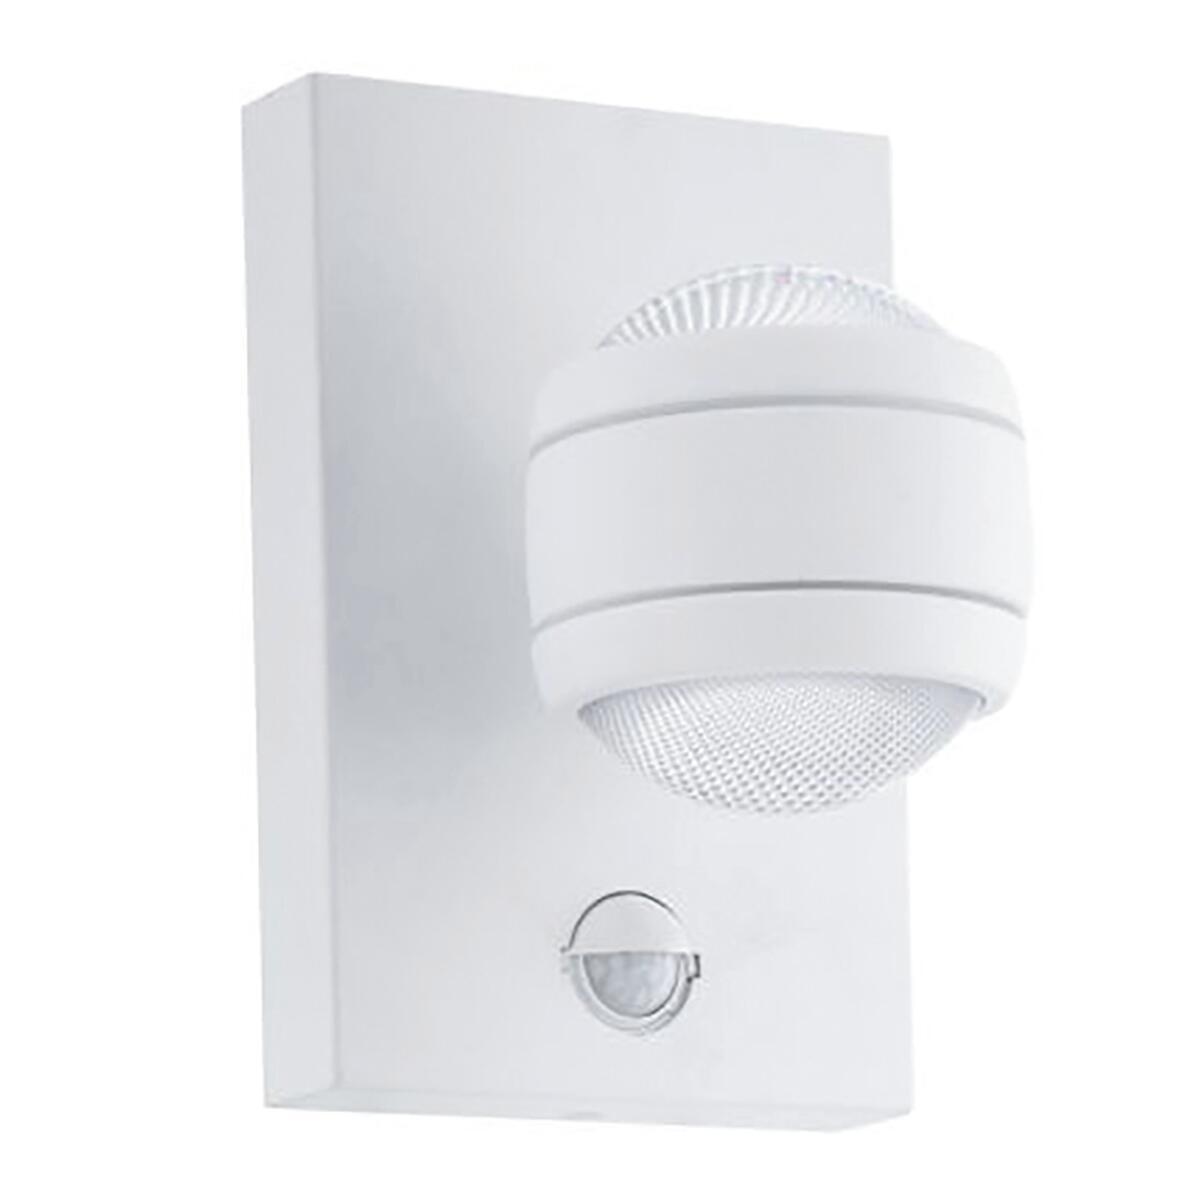 Applique Sesimba LED integrato in inox, bianco, 3.7W 560LM IP44 EGLO - 2